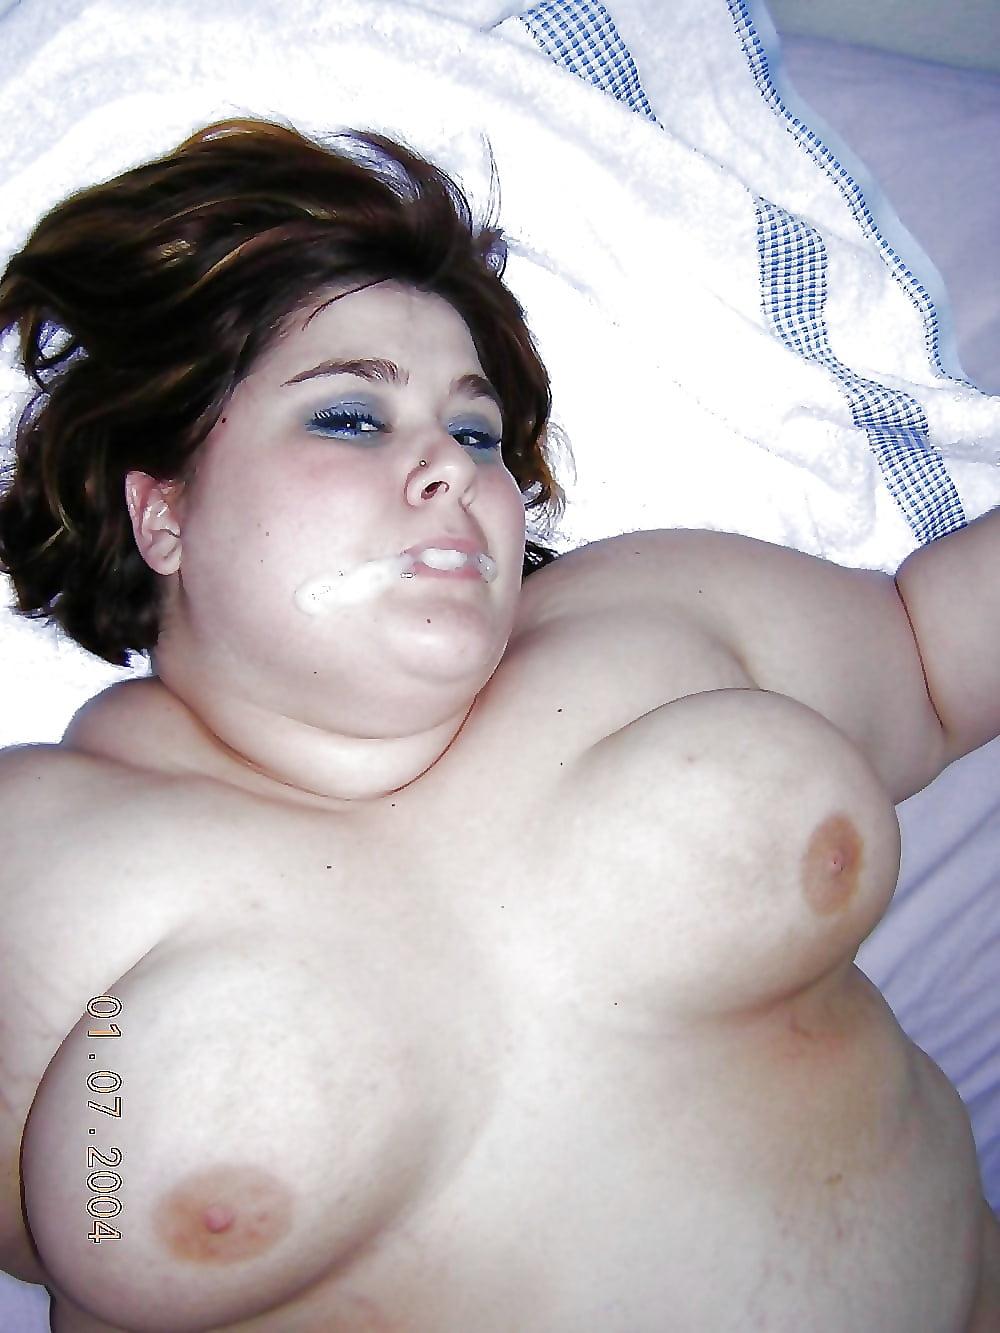 jewish-chubby-porn-woman-facial-gif-sexy-freshman